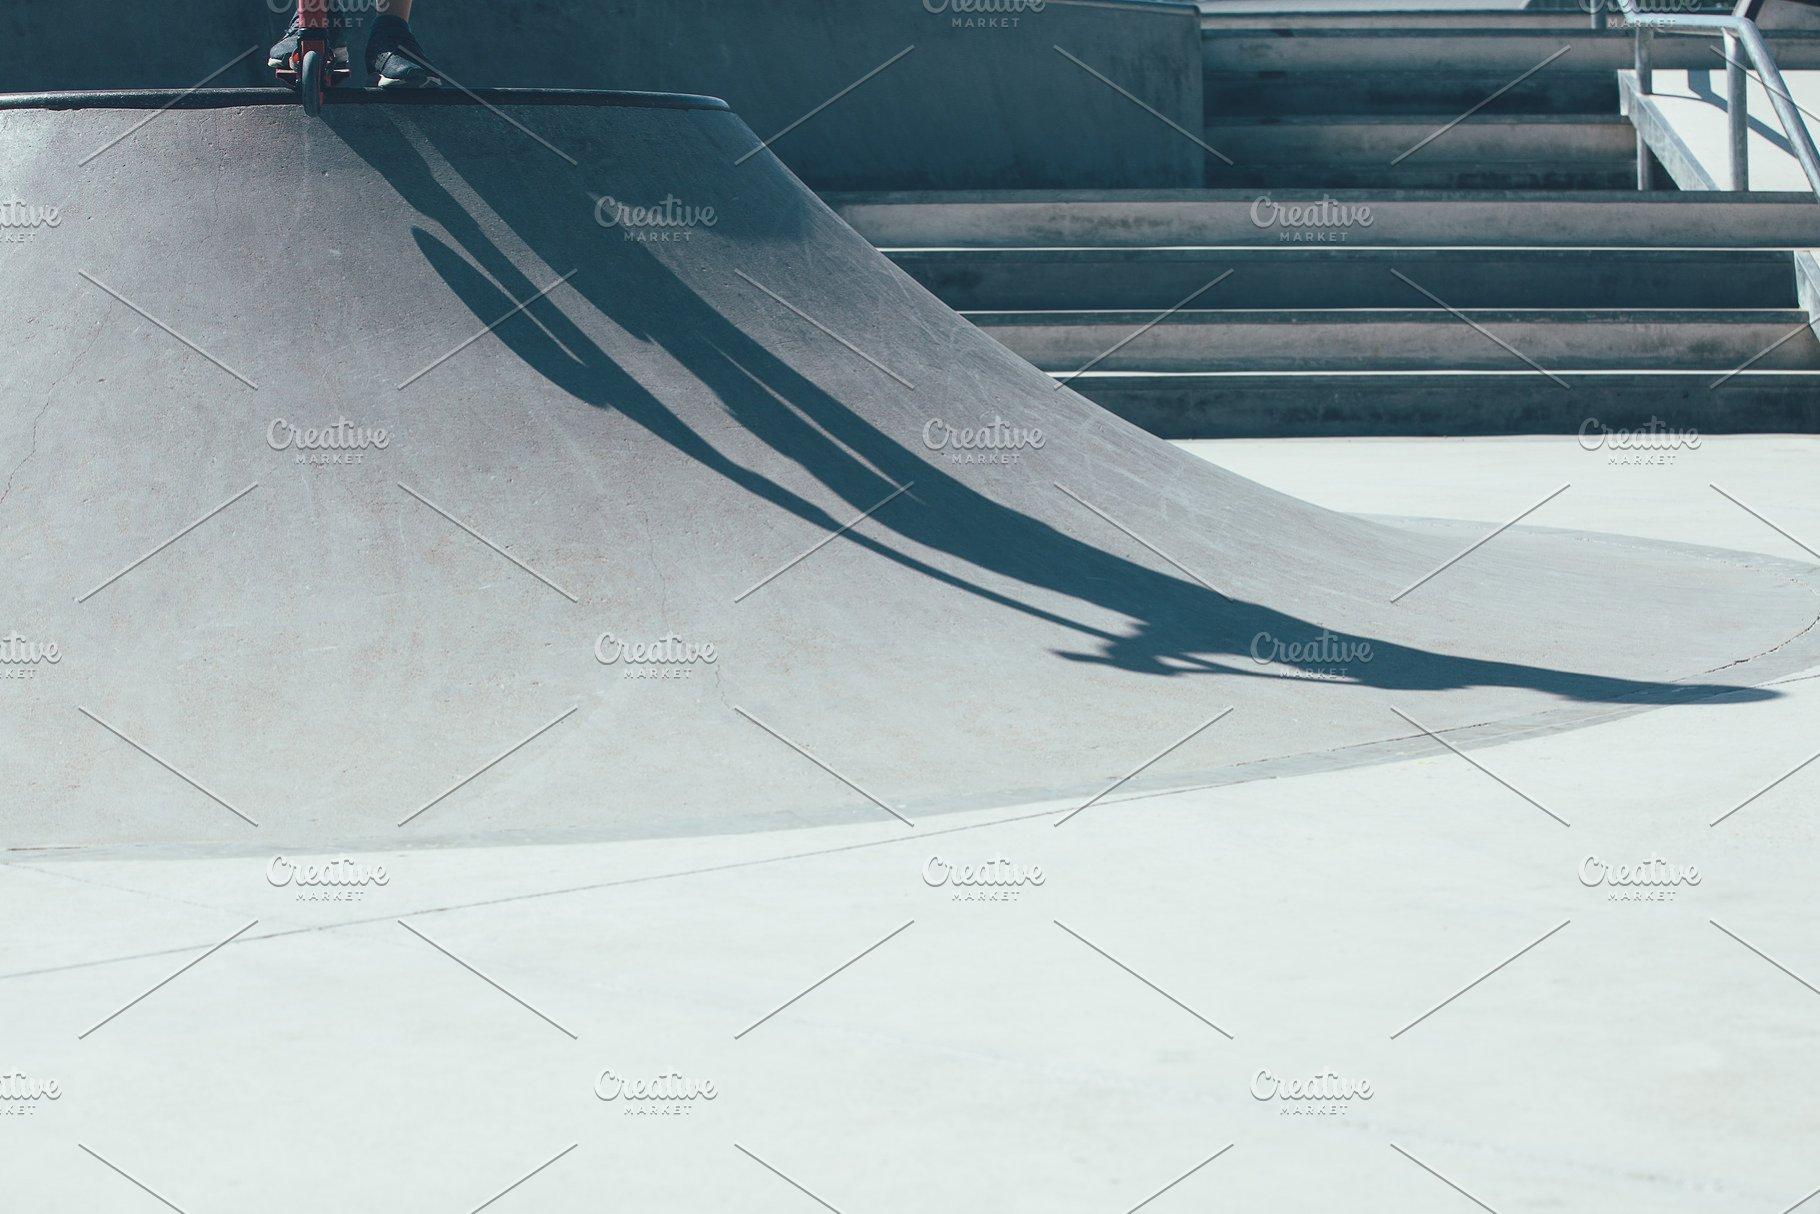 Skate park ramp detail view